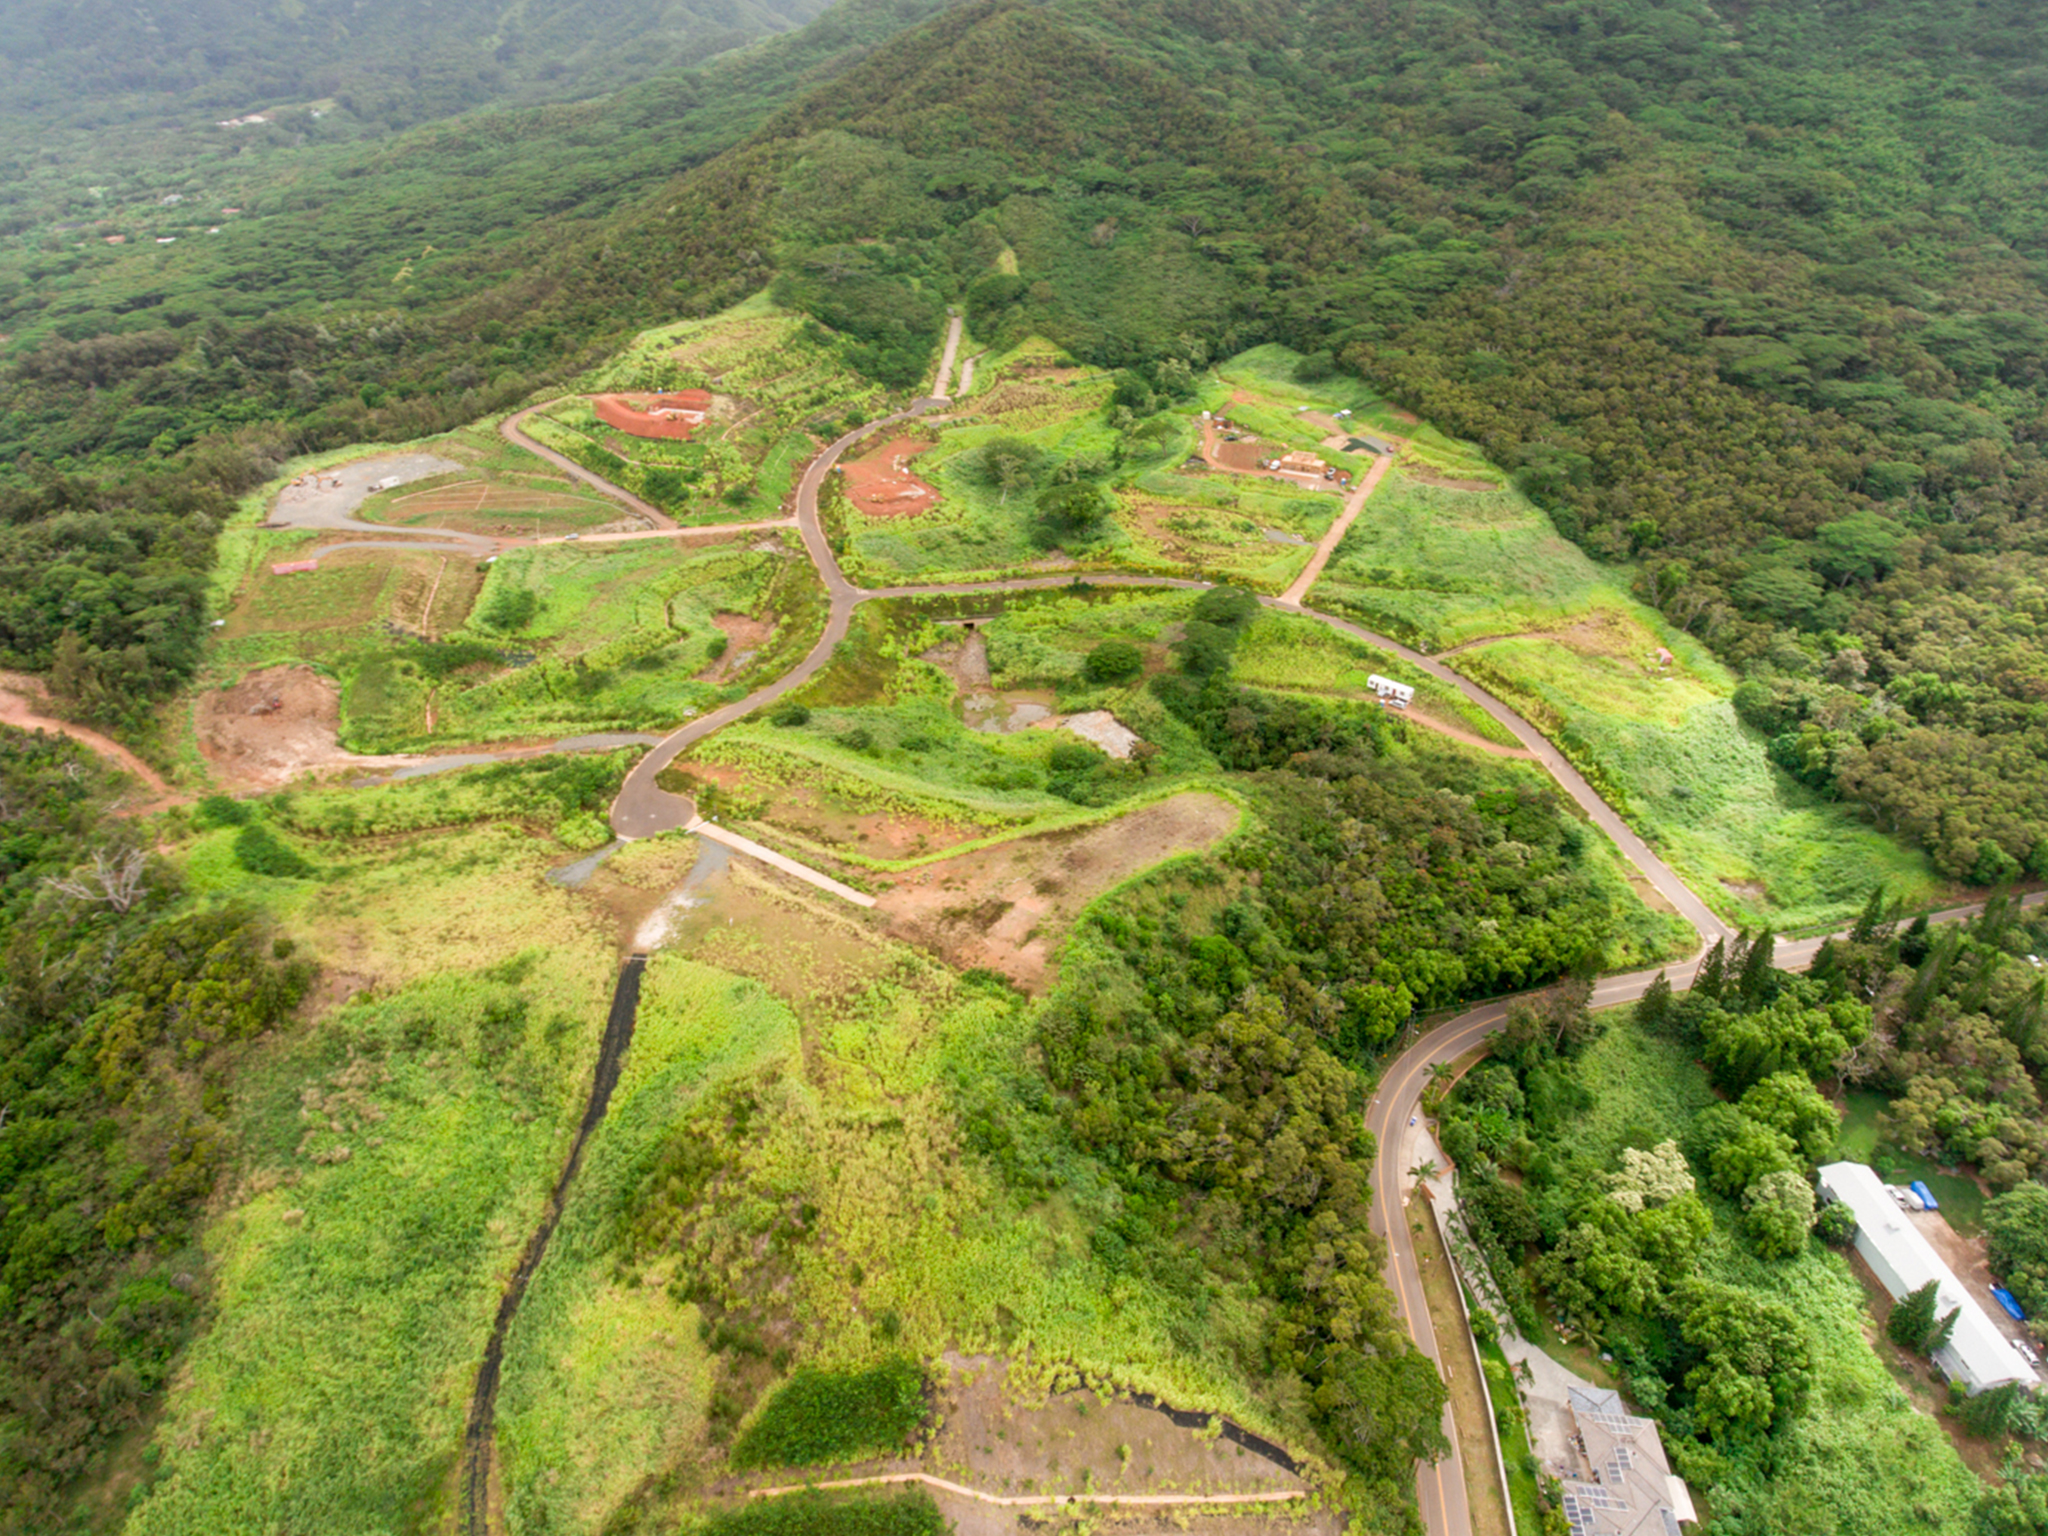 Olomana_Aerial3.jpg